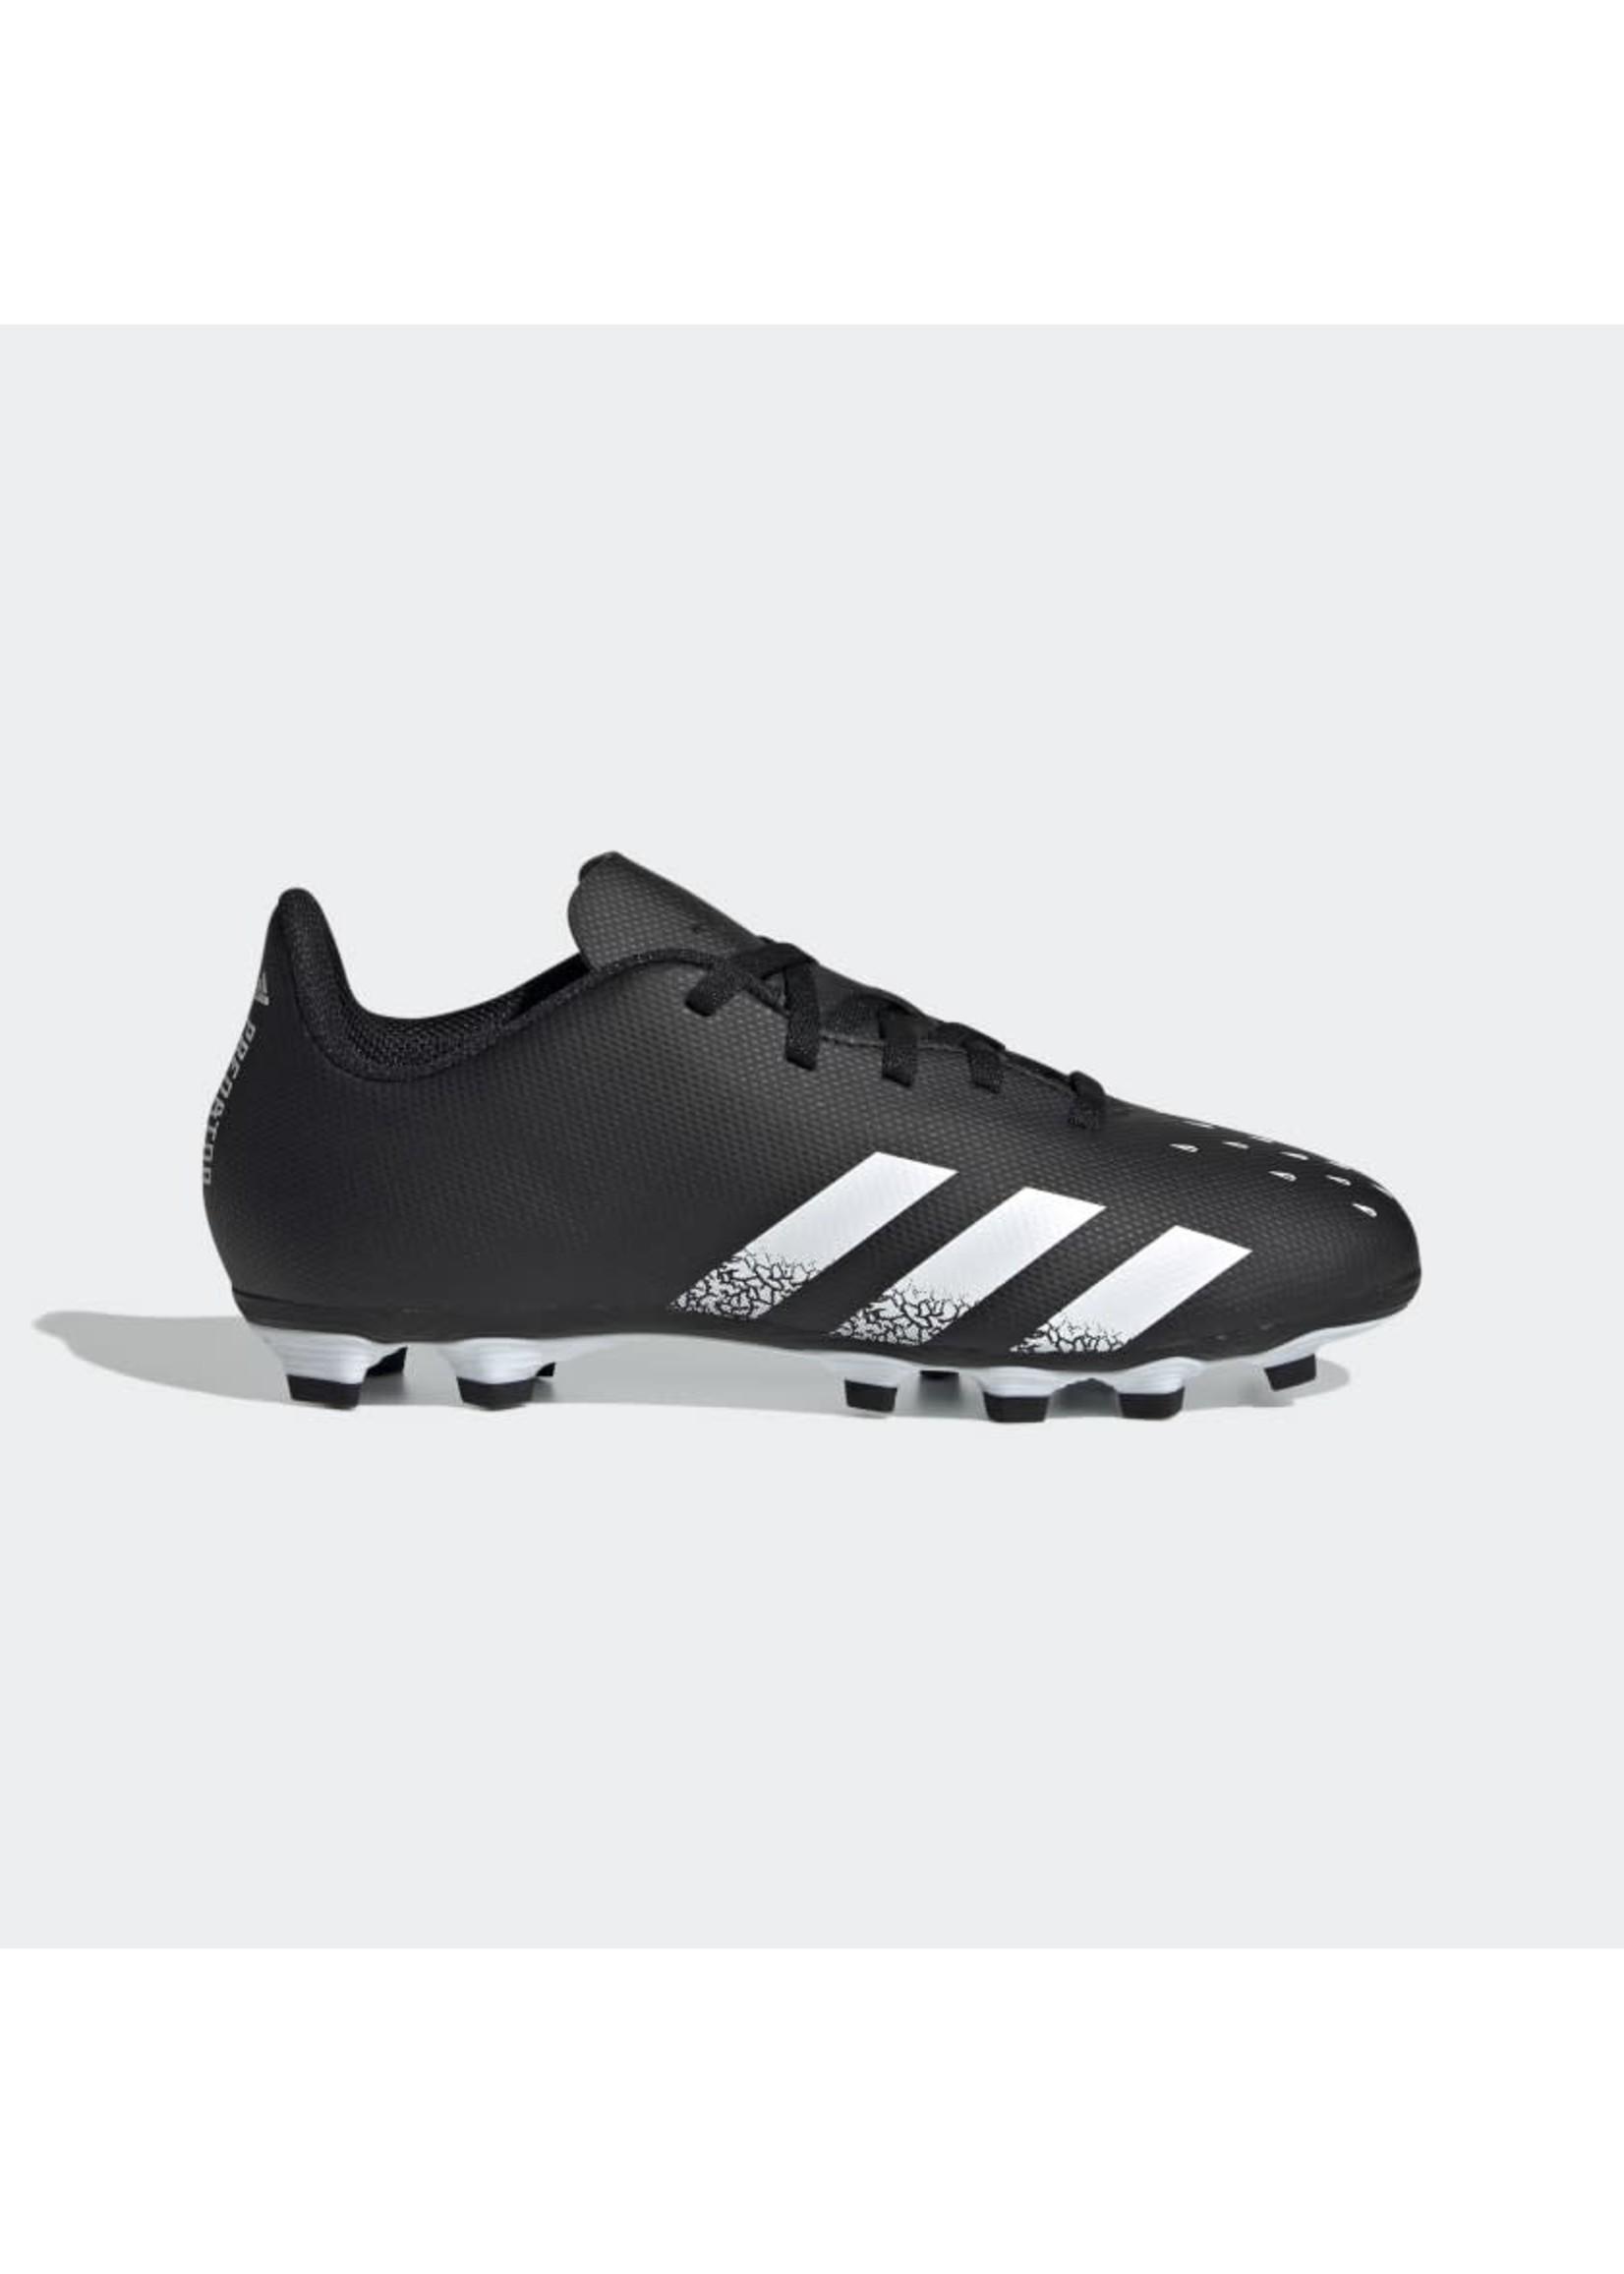 Adidas PREDATOR FREAK .4 FxG J